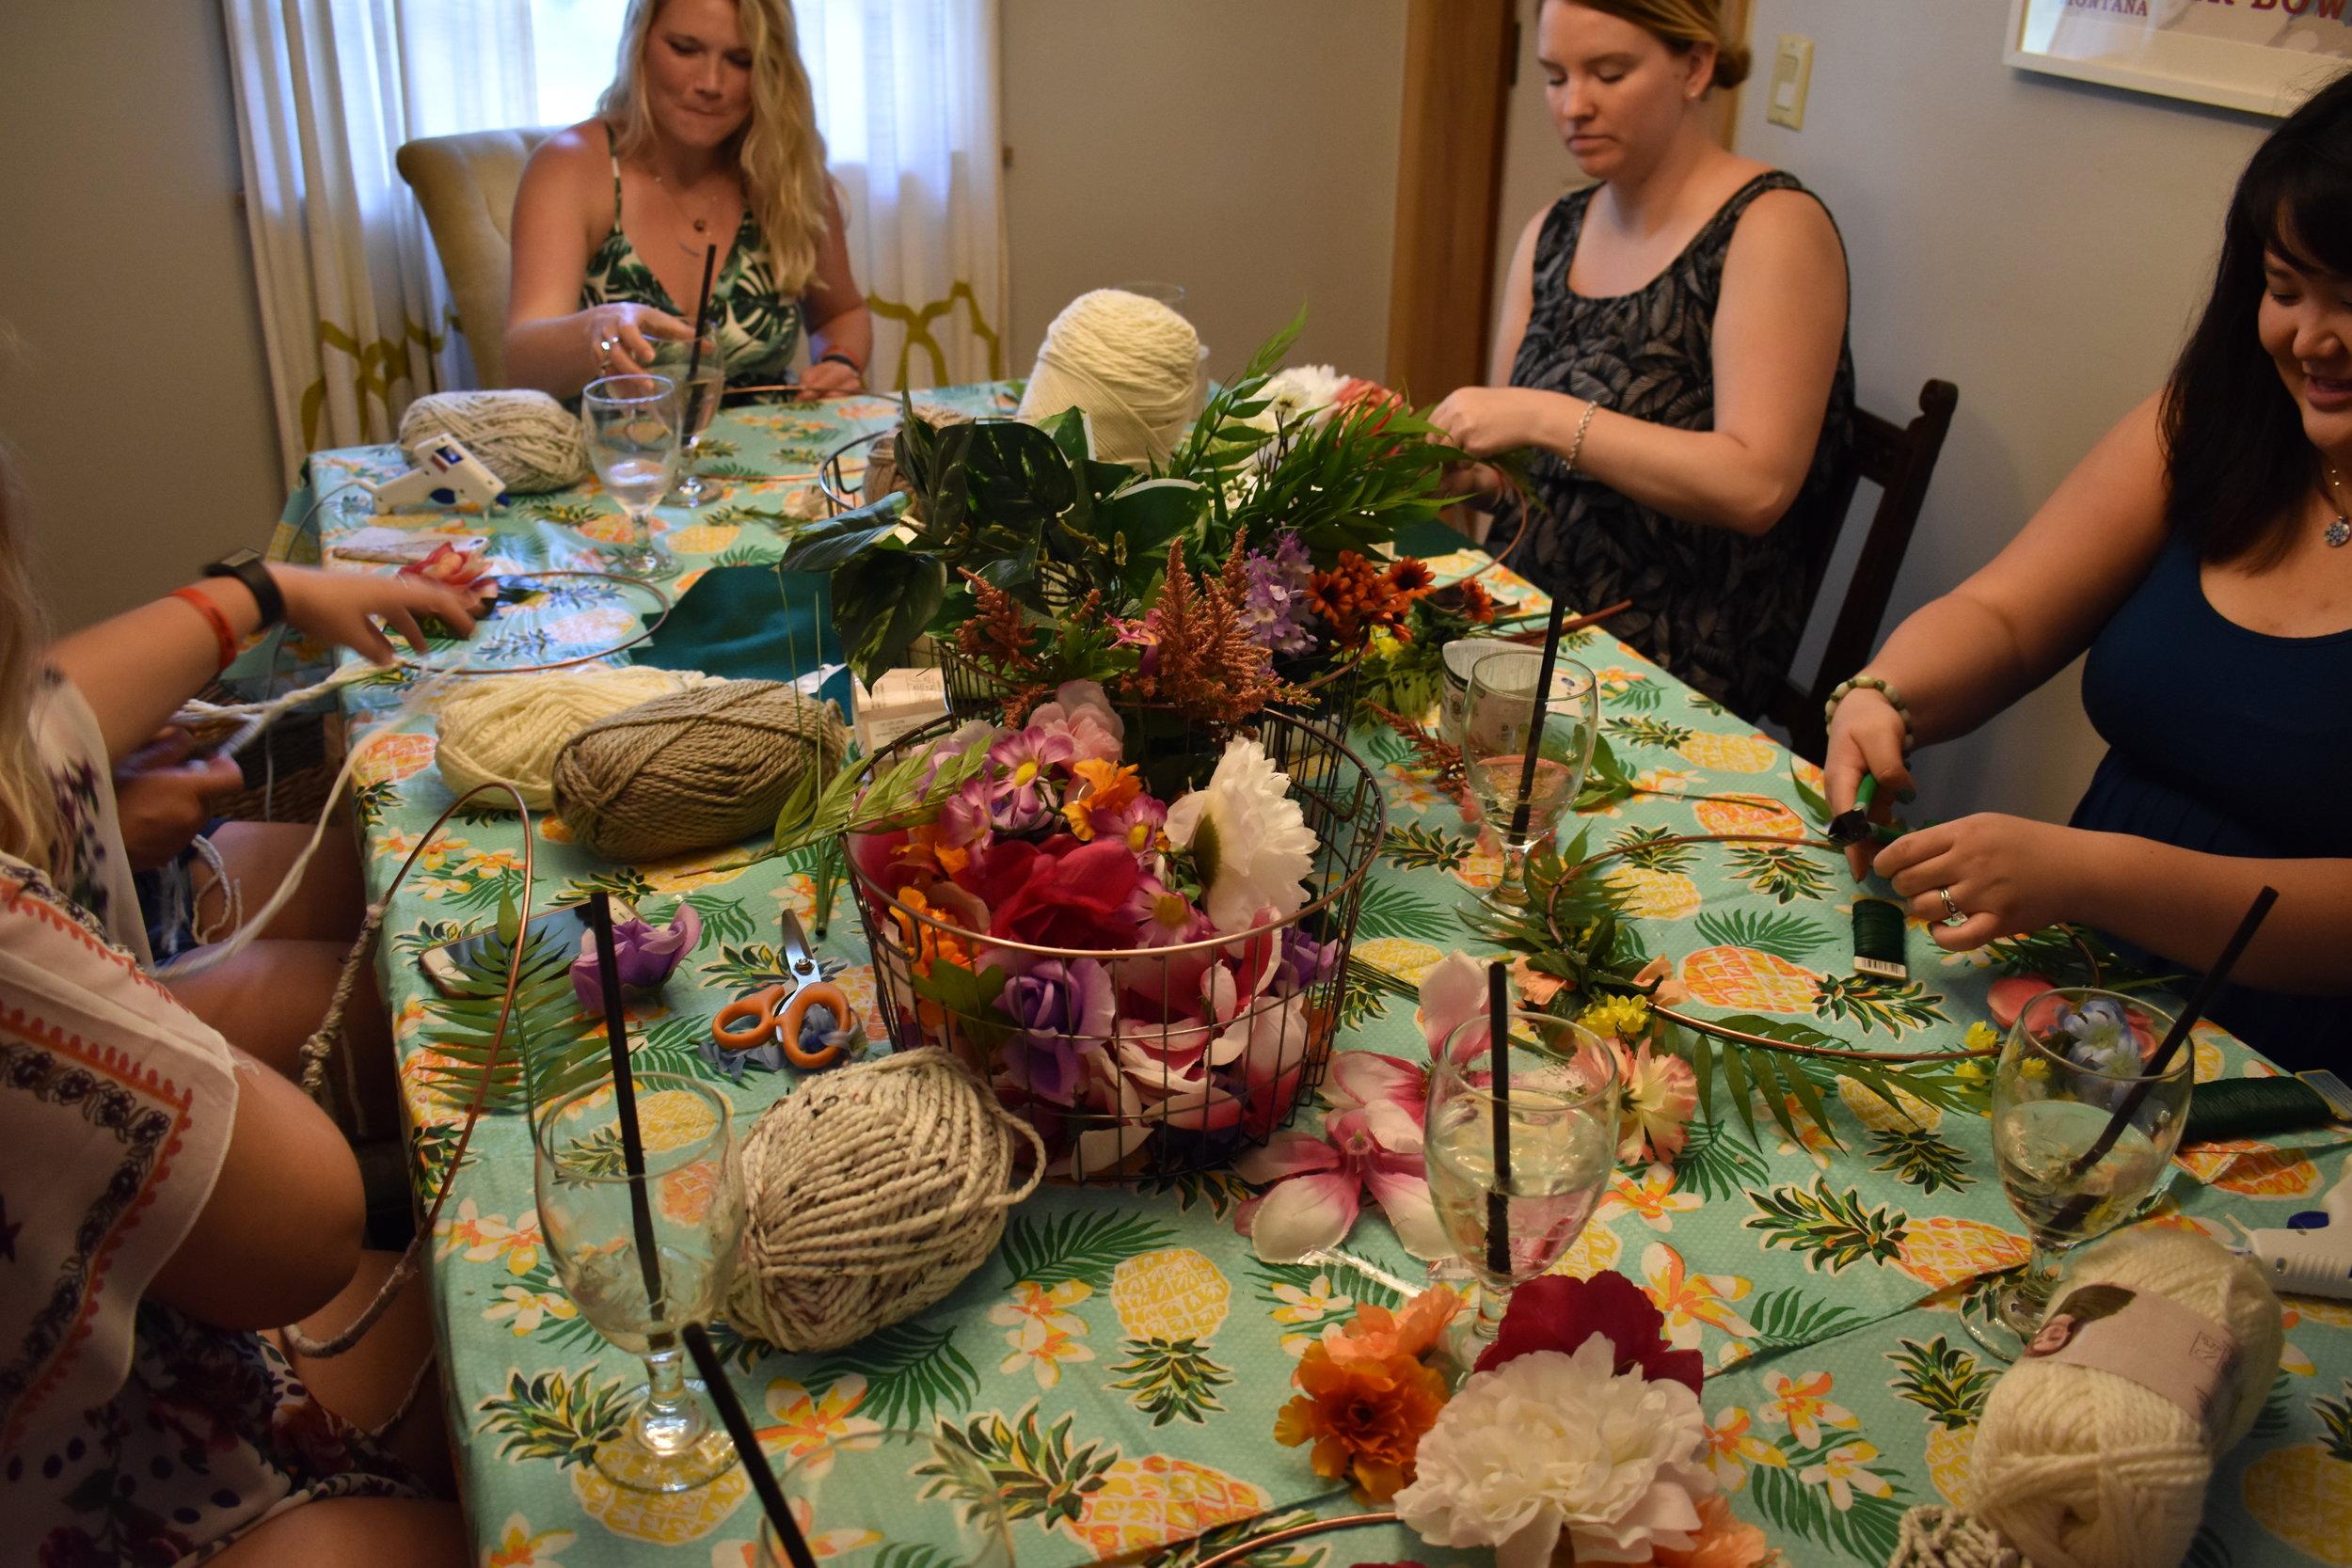 Boho Floral Wreath Making Craft Day - Bridal Shower